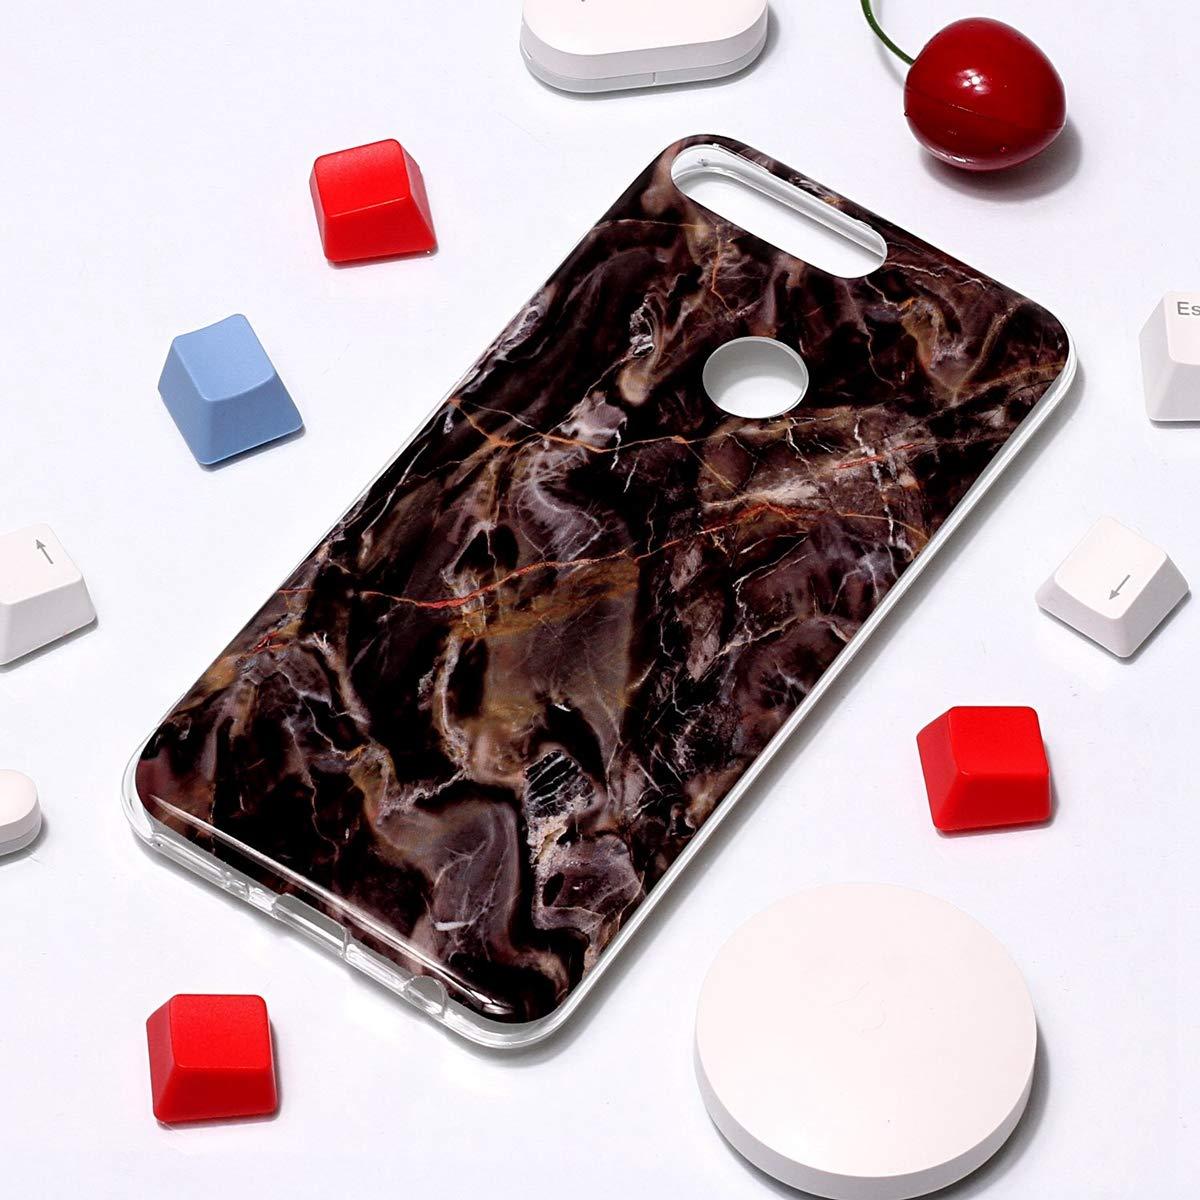 Diamant Tricolore Misstars Coque en Silicone pour Huawei Honor 7A Y6 2018 Marbre Ultra Mince TPU Souple Flexible Housse Etui de Protection Anti-Choc Anti-Rayures Bumper